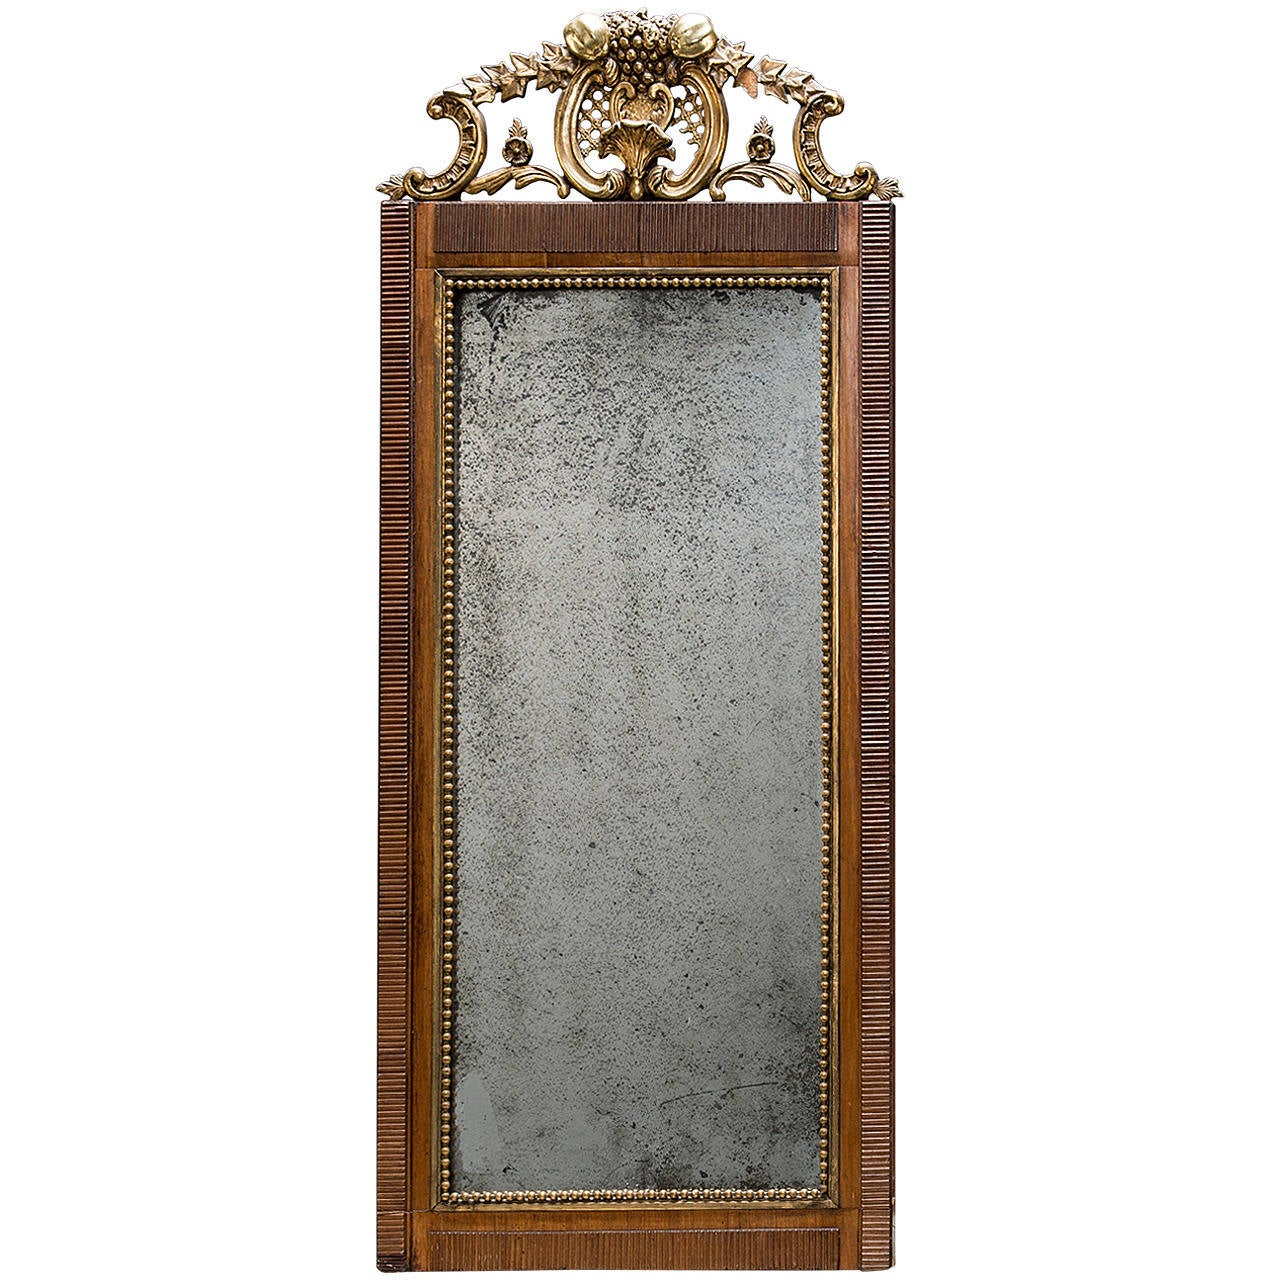 Louis XVI mirror, France late 18th Century